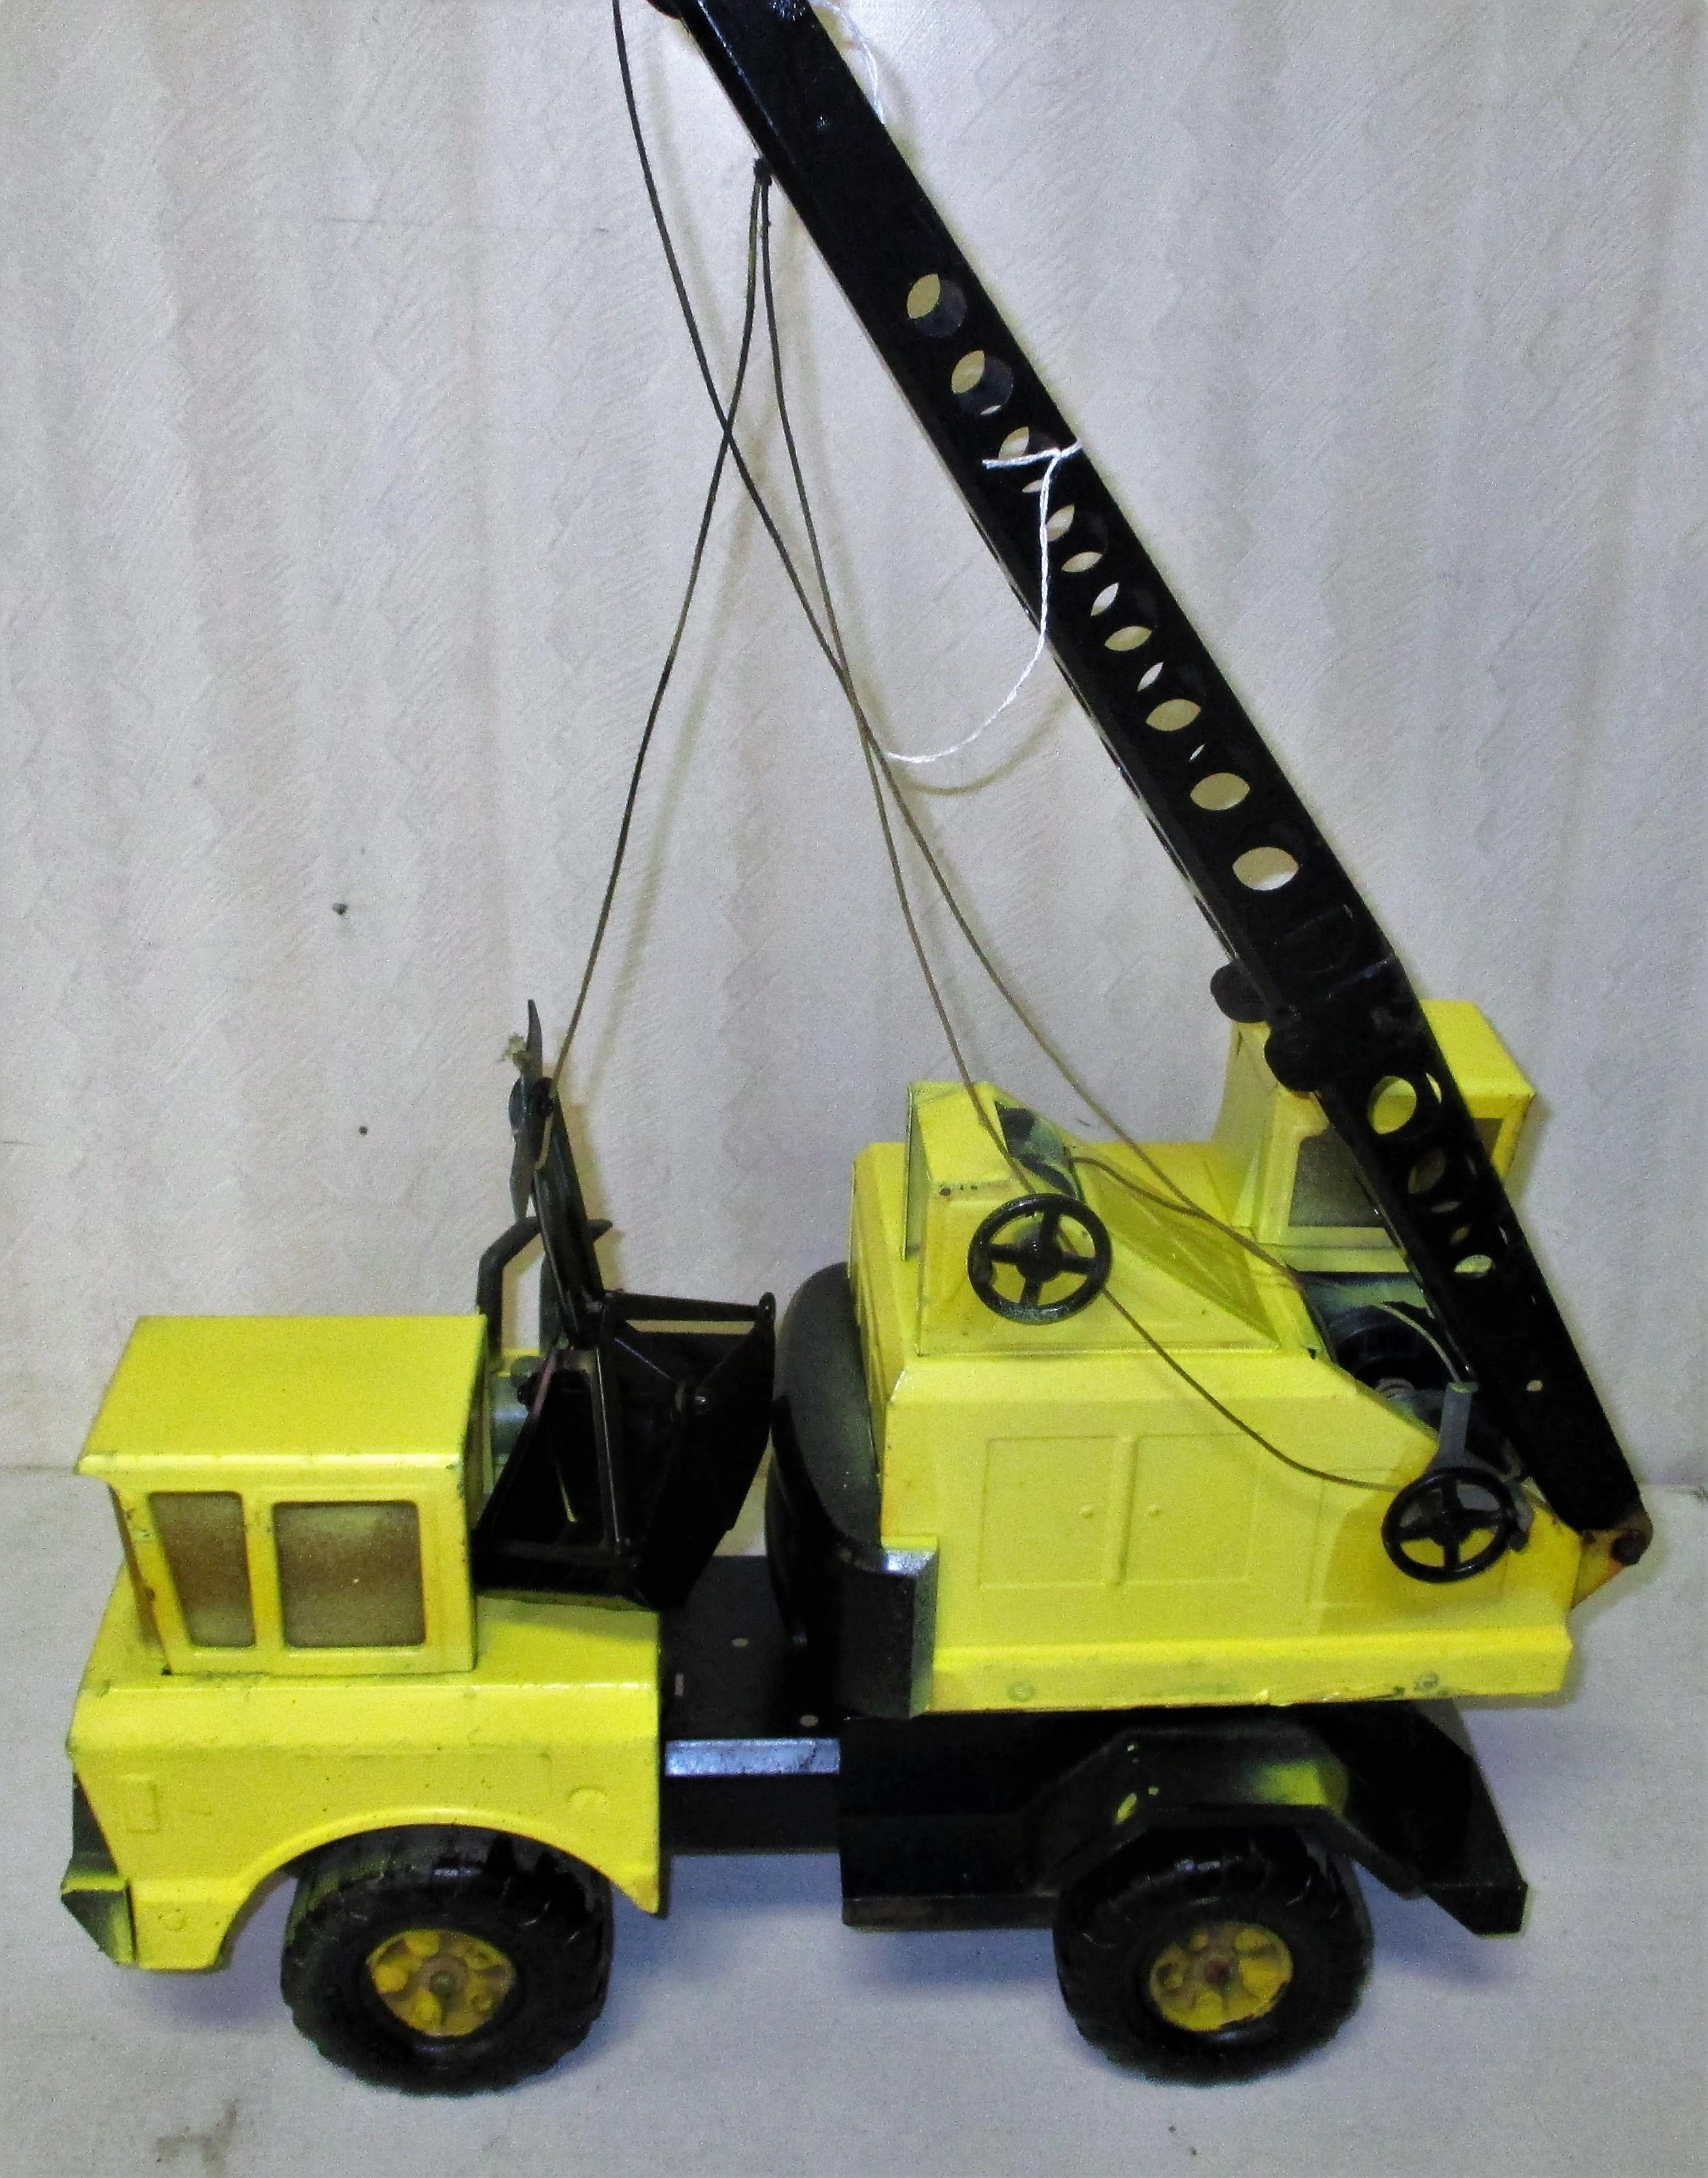 107: Tonka Mighty Crane MR-970 Dragline